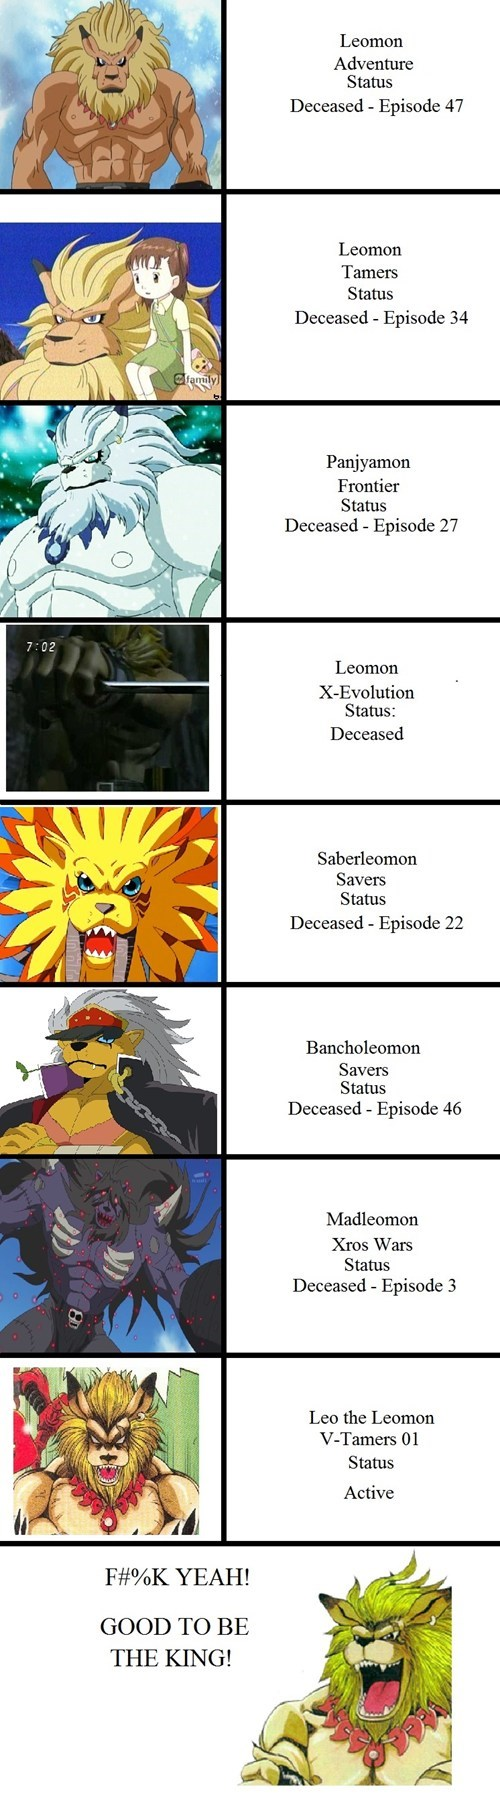 anime digimon - 7826309888